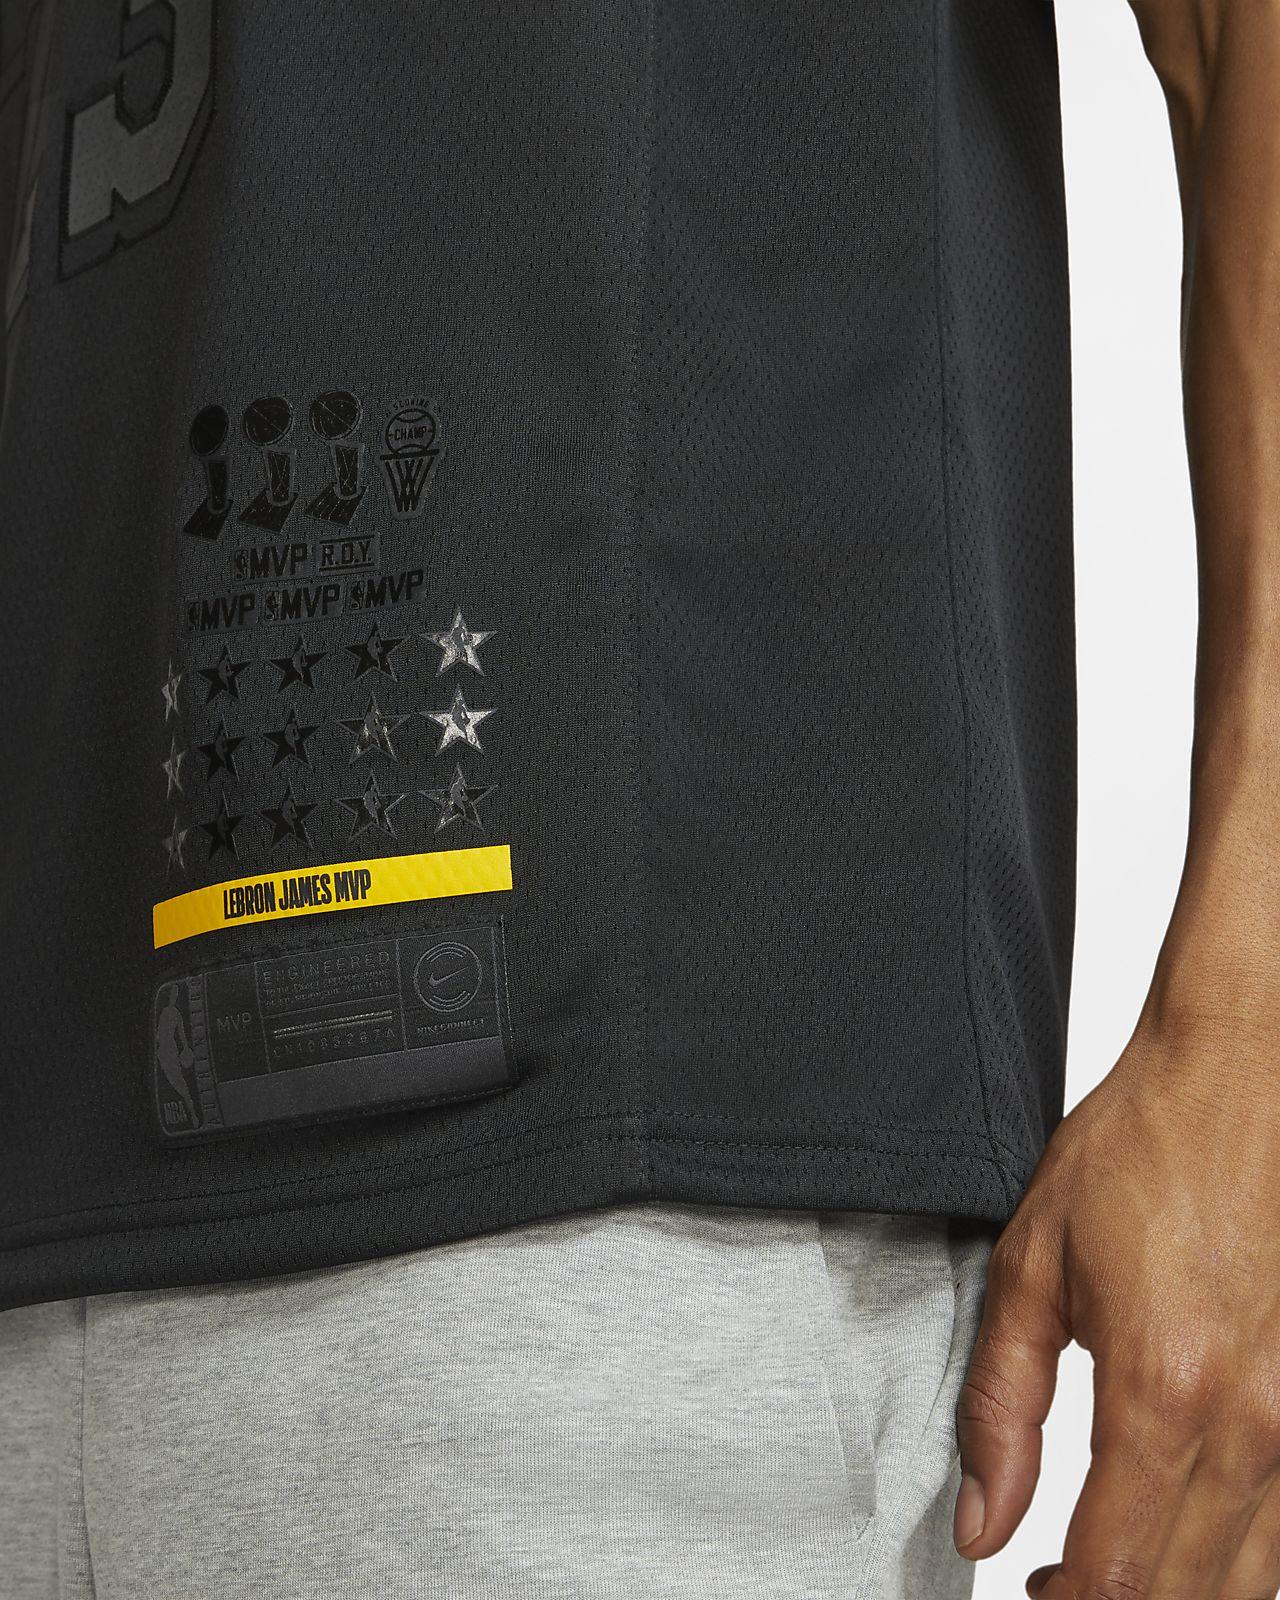 timeless design be522 b046c LeBron James MVP Swingman (Los Angeles Lakers) Men's Nike NBA Connected  Jersey